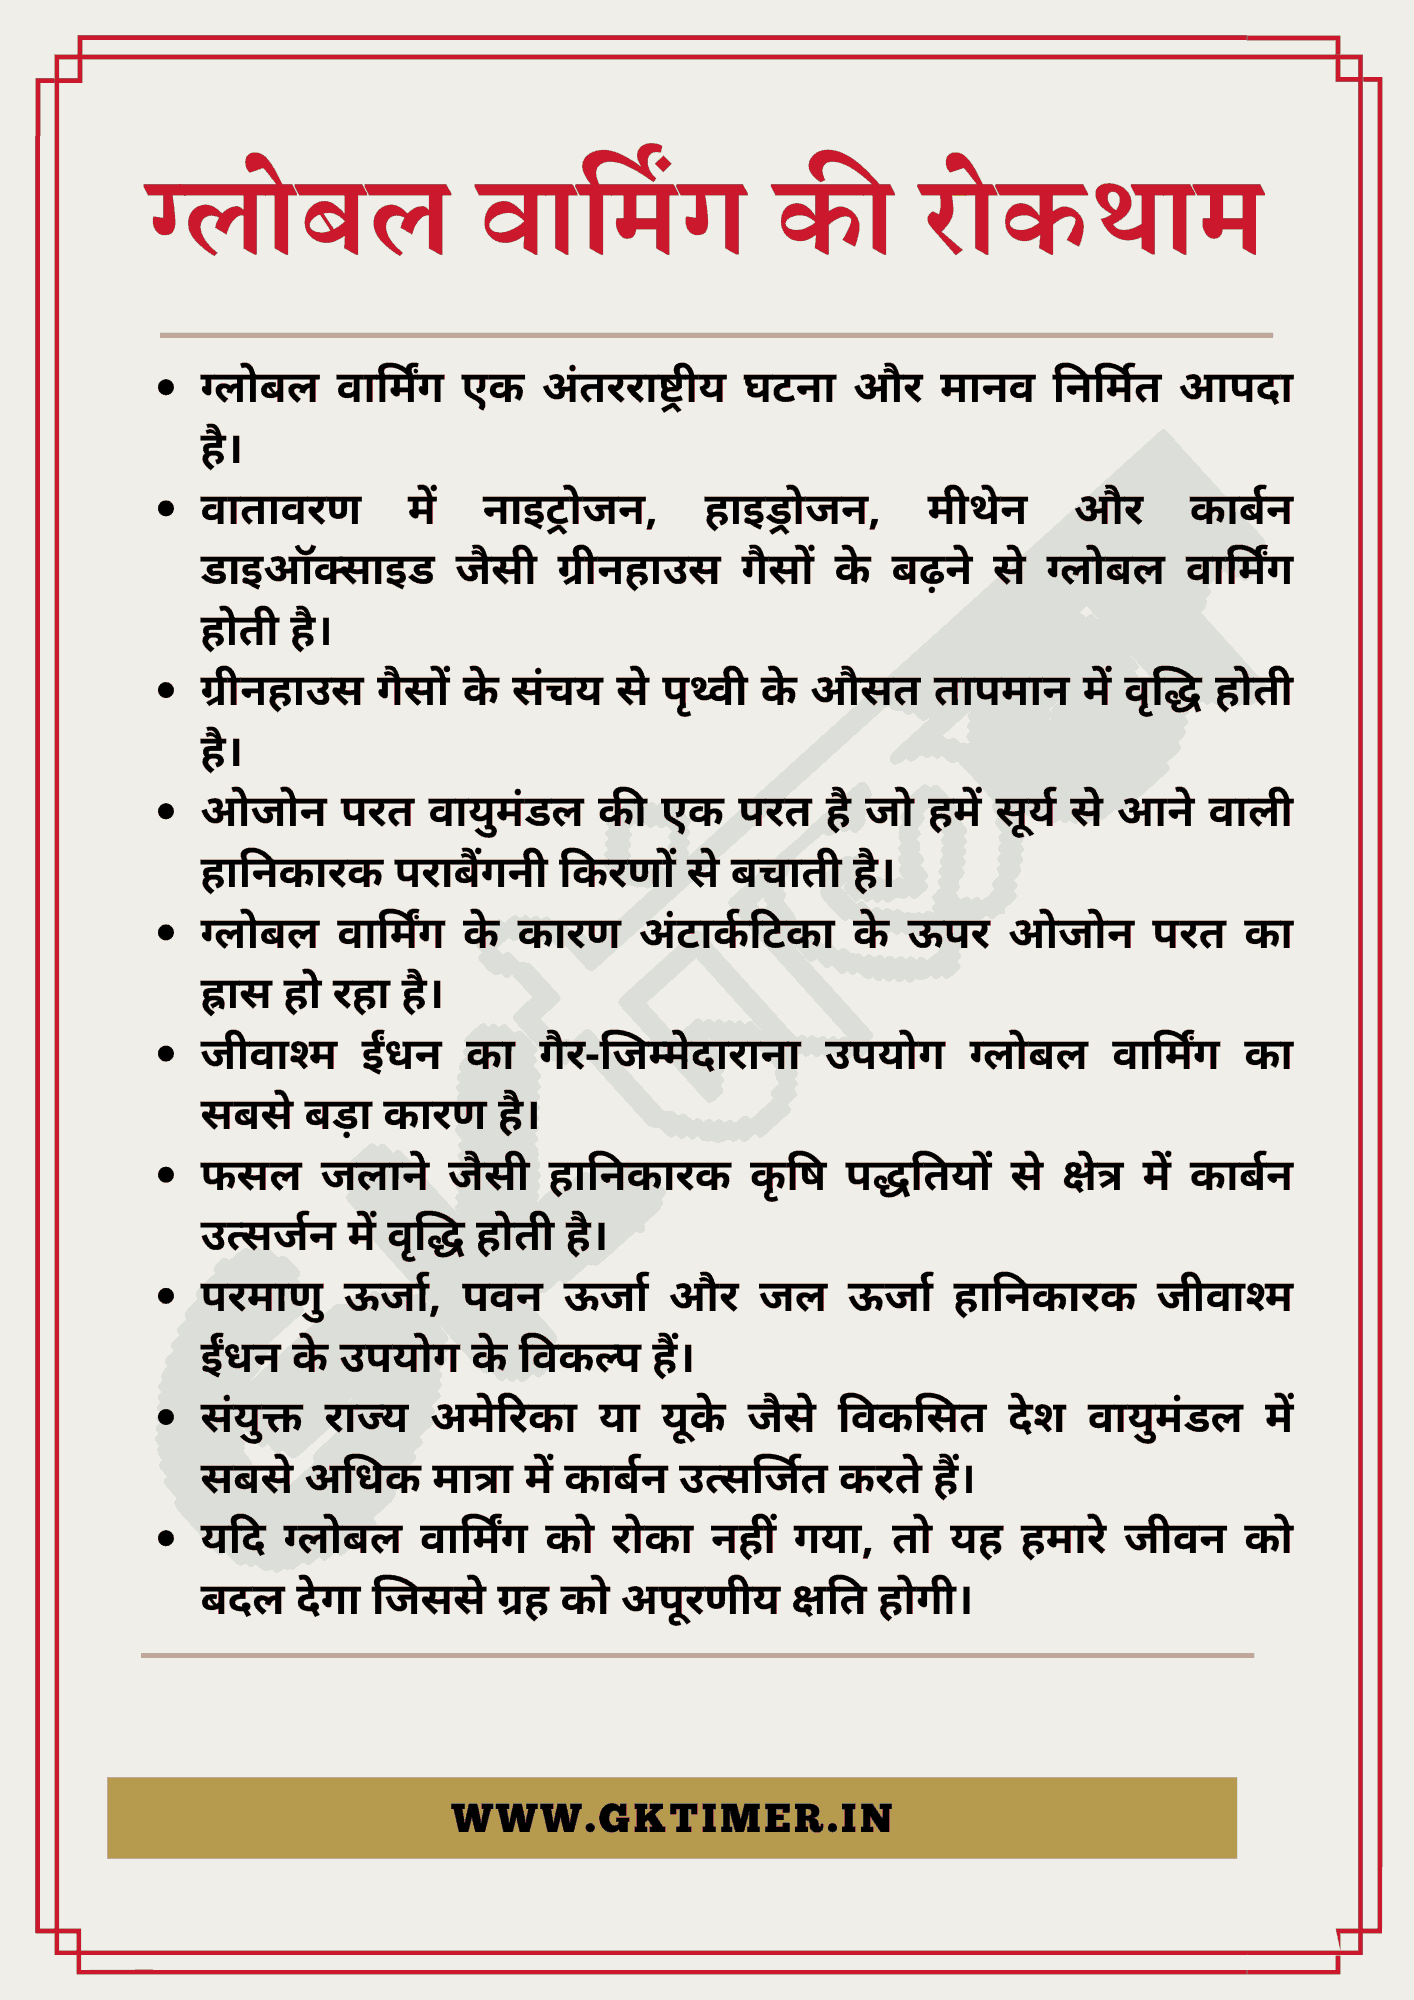 ग्लोबल वार्मिंग की रोकथाम पर निबंध   Essay on Prevention of Global Warming in Hindi   10 Lines on Prevention of Global Warming in Hindi